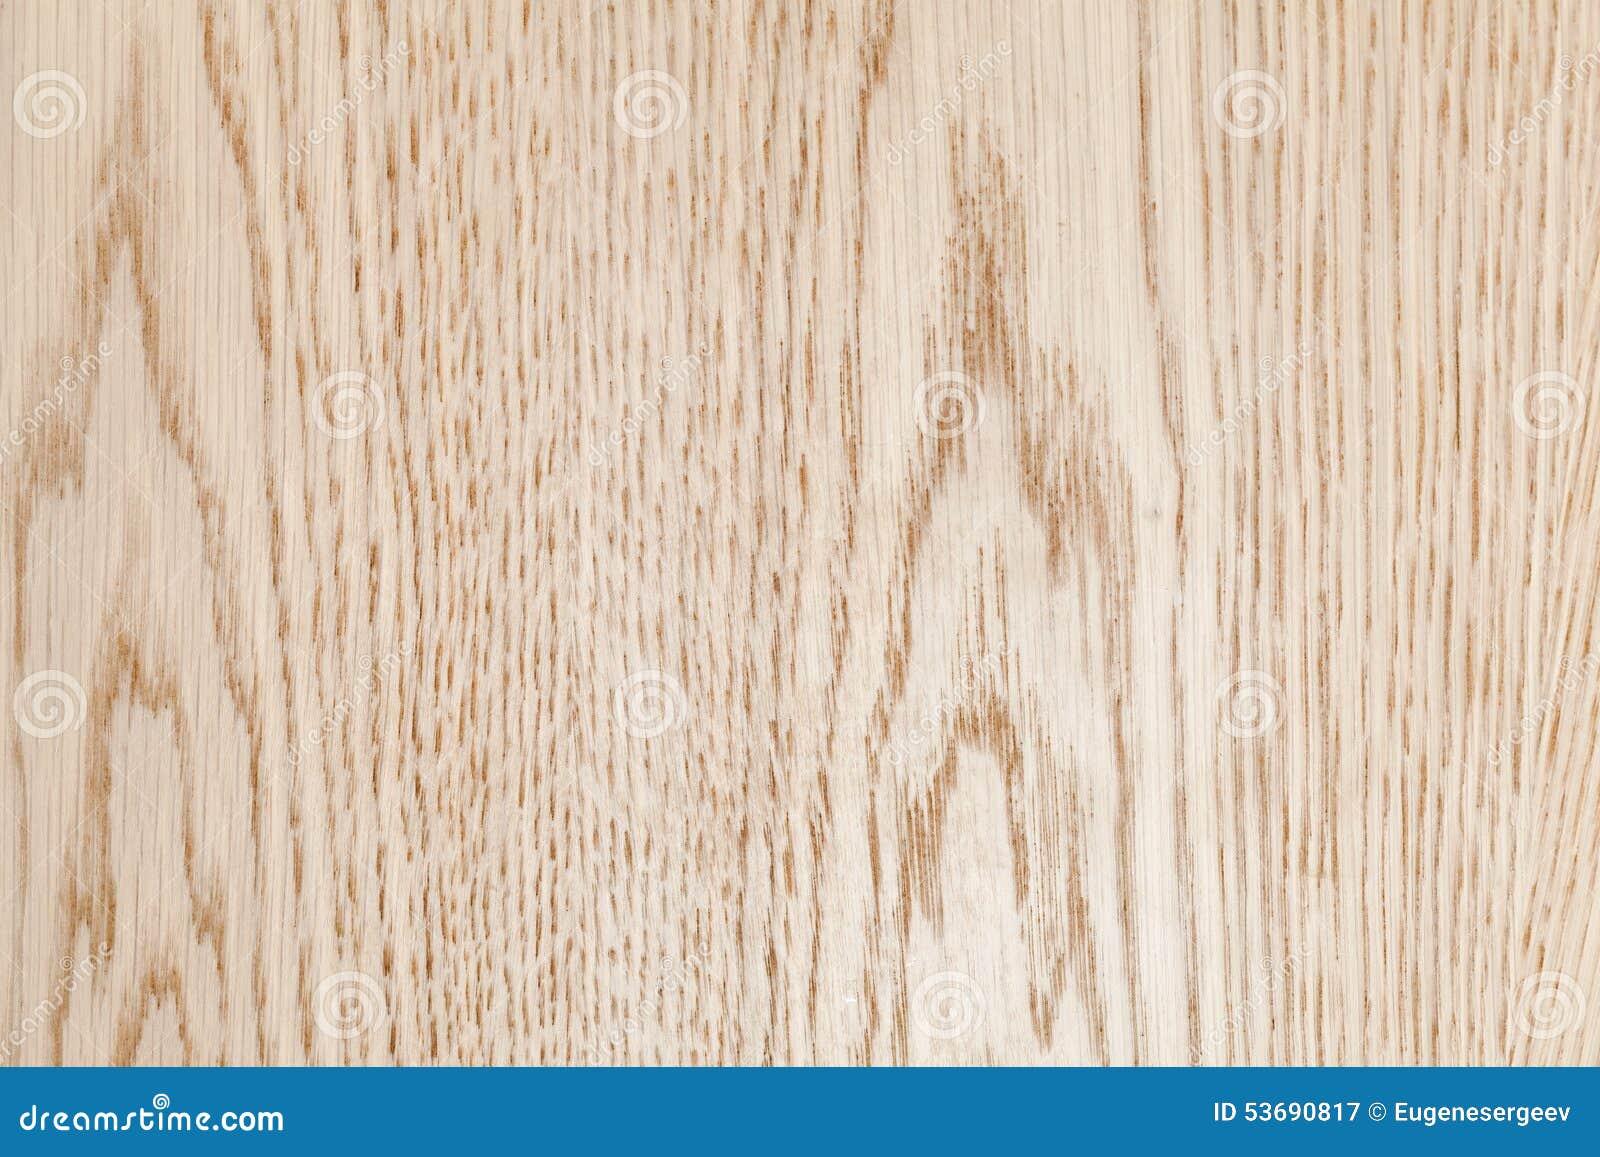 texture en bois beige l g re de stratifi photo stock image 53690817. Black Bedroom Furniture Sets. Home Design Ideas